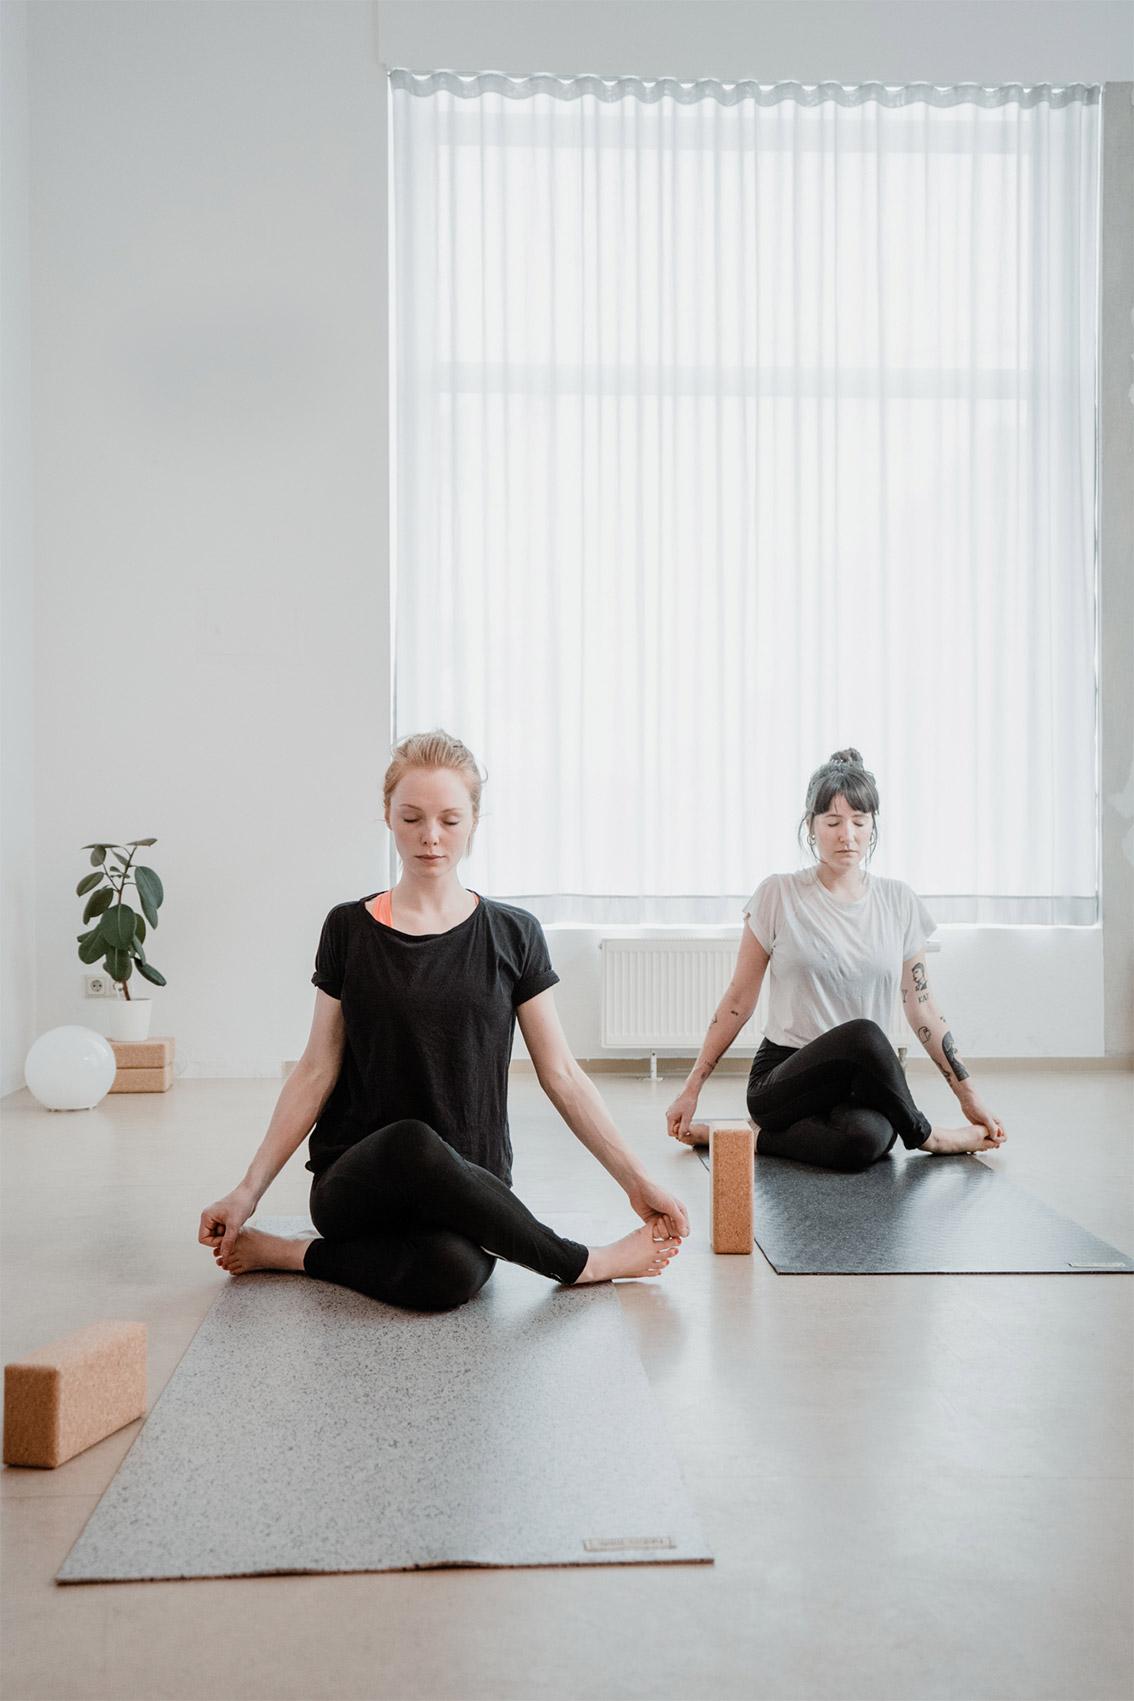 Vinyasa Yoga Kurs im Mindt Yoga Studio in Leipzig Plagwitz